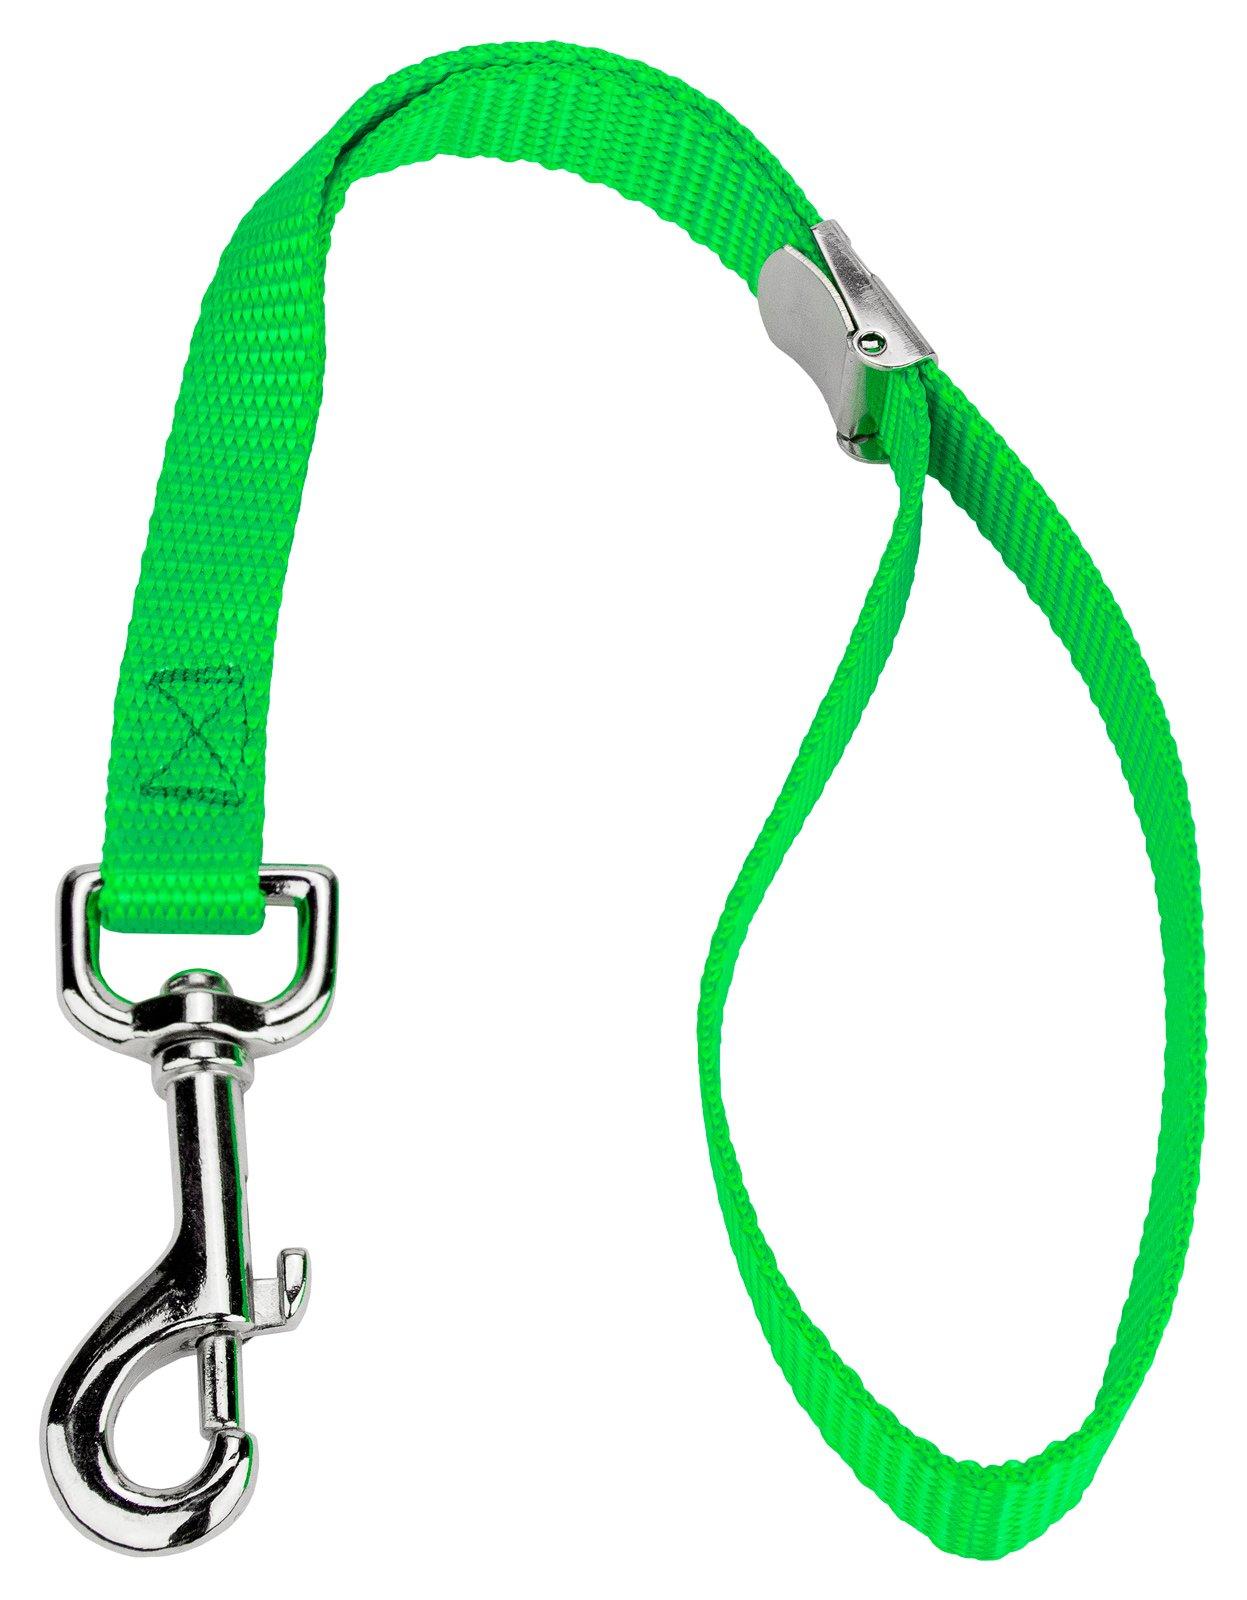 12 - Country Brook Petz 5/8 Inch Hot Lime Green Nylon Cam Lock Grooming Loop